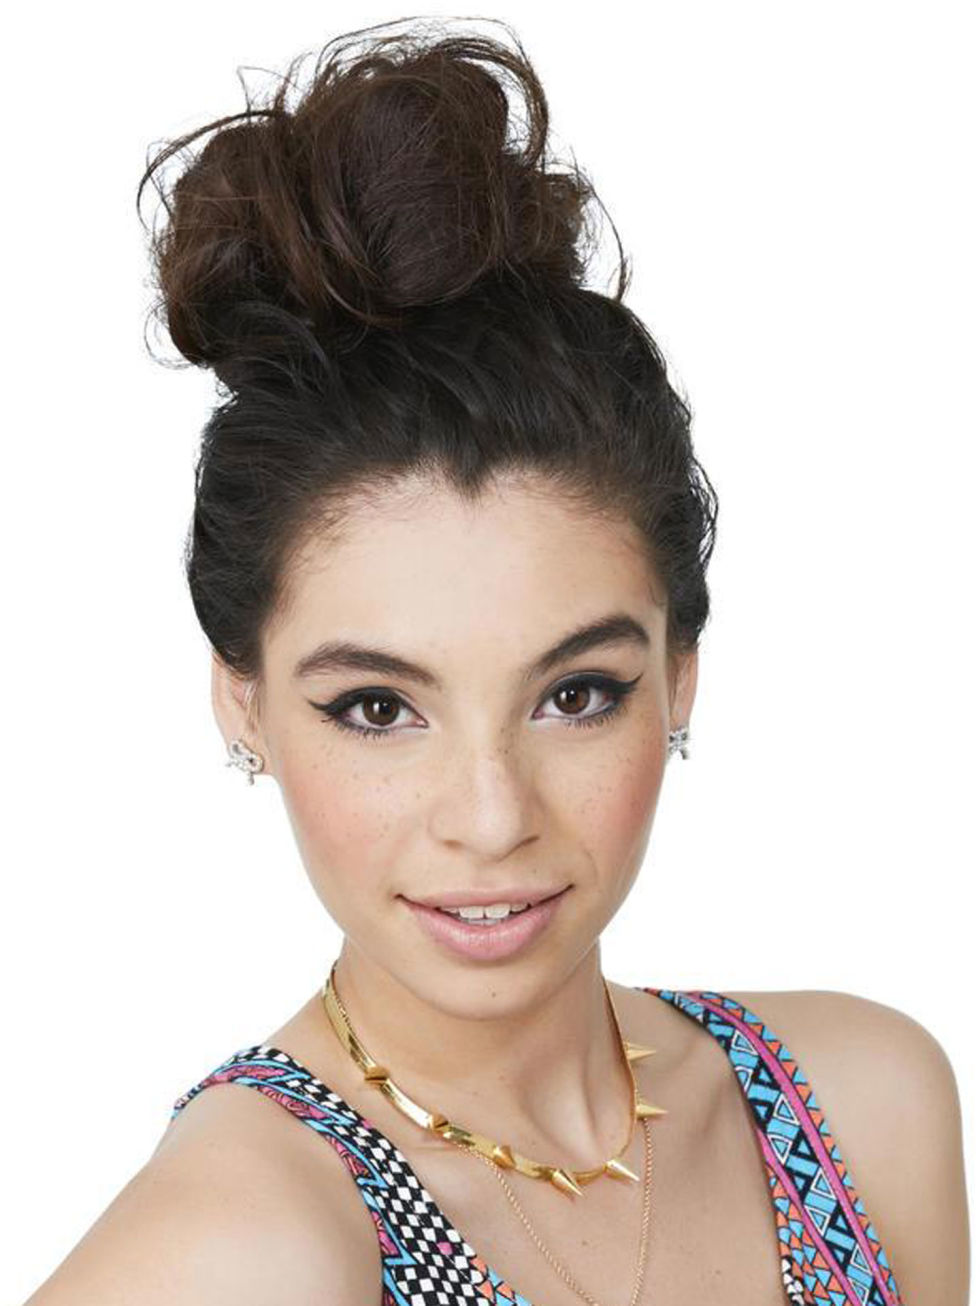 Brilliant 10 Blowdryer Free Hairstyles Quick And Easy Summer Hairstyles Short Hairstyles Gunalazisus